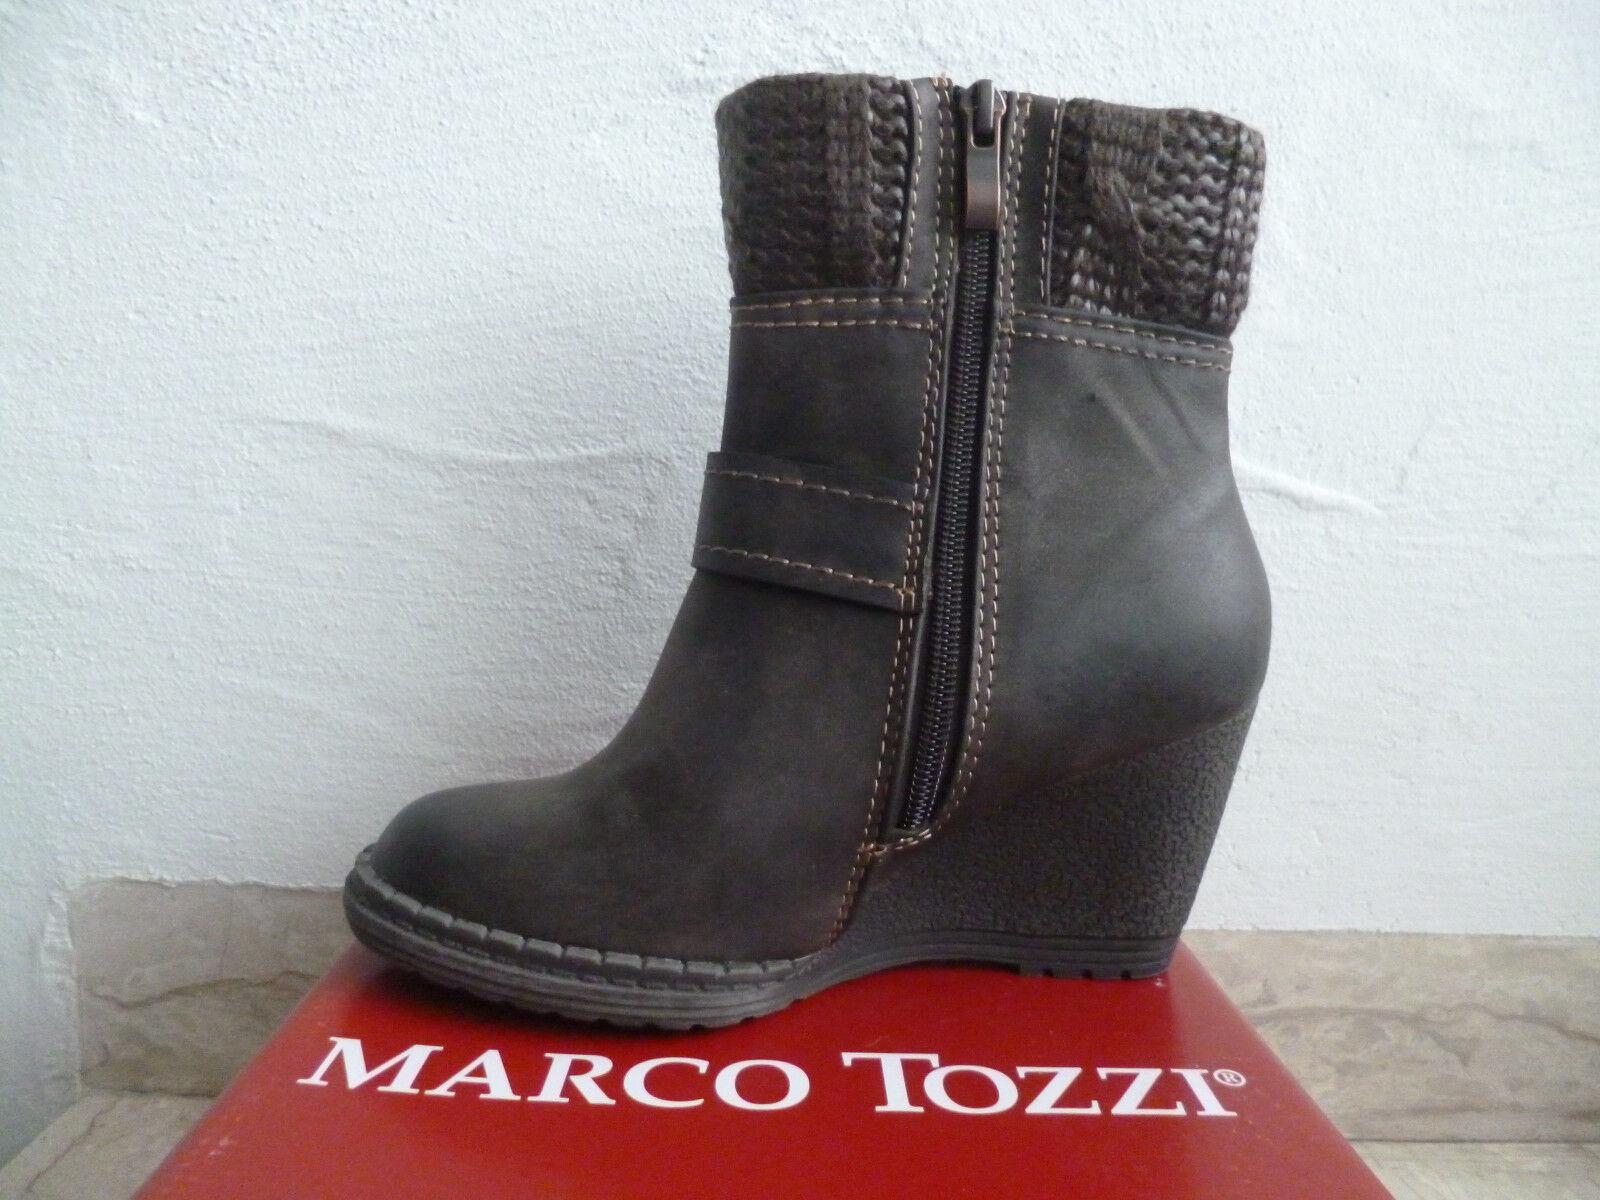 Marco Tozzi Stivali Donna Stivaletti Stieflette Stieflette Stieflette stivali Suola a Zeppa   Vendita  801c1a